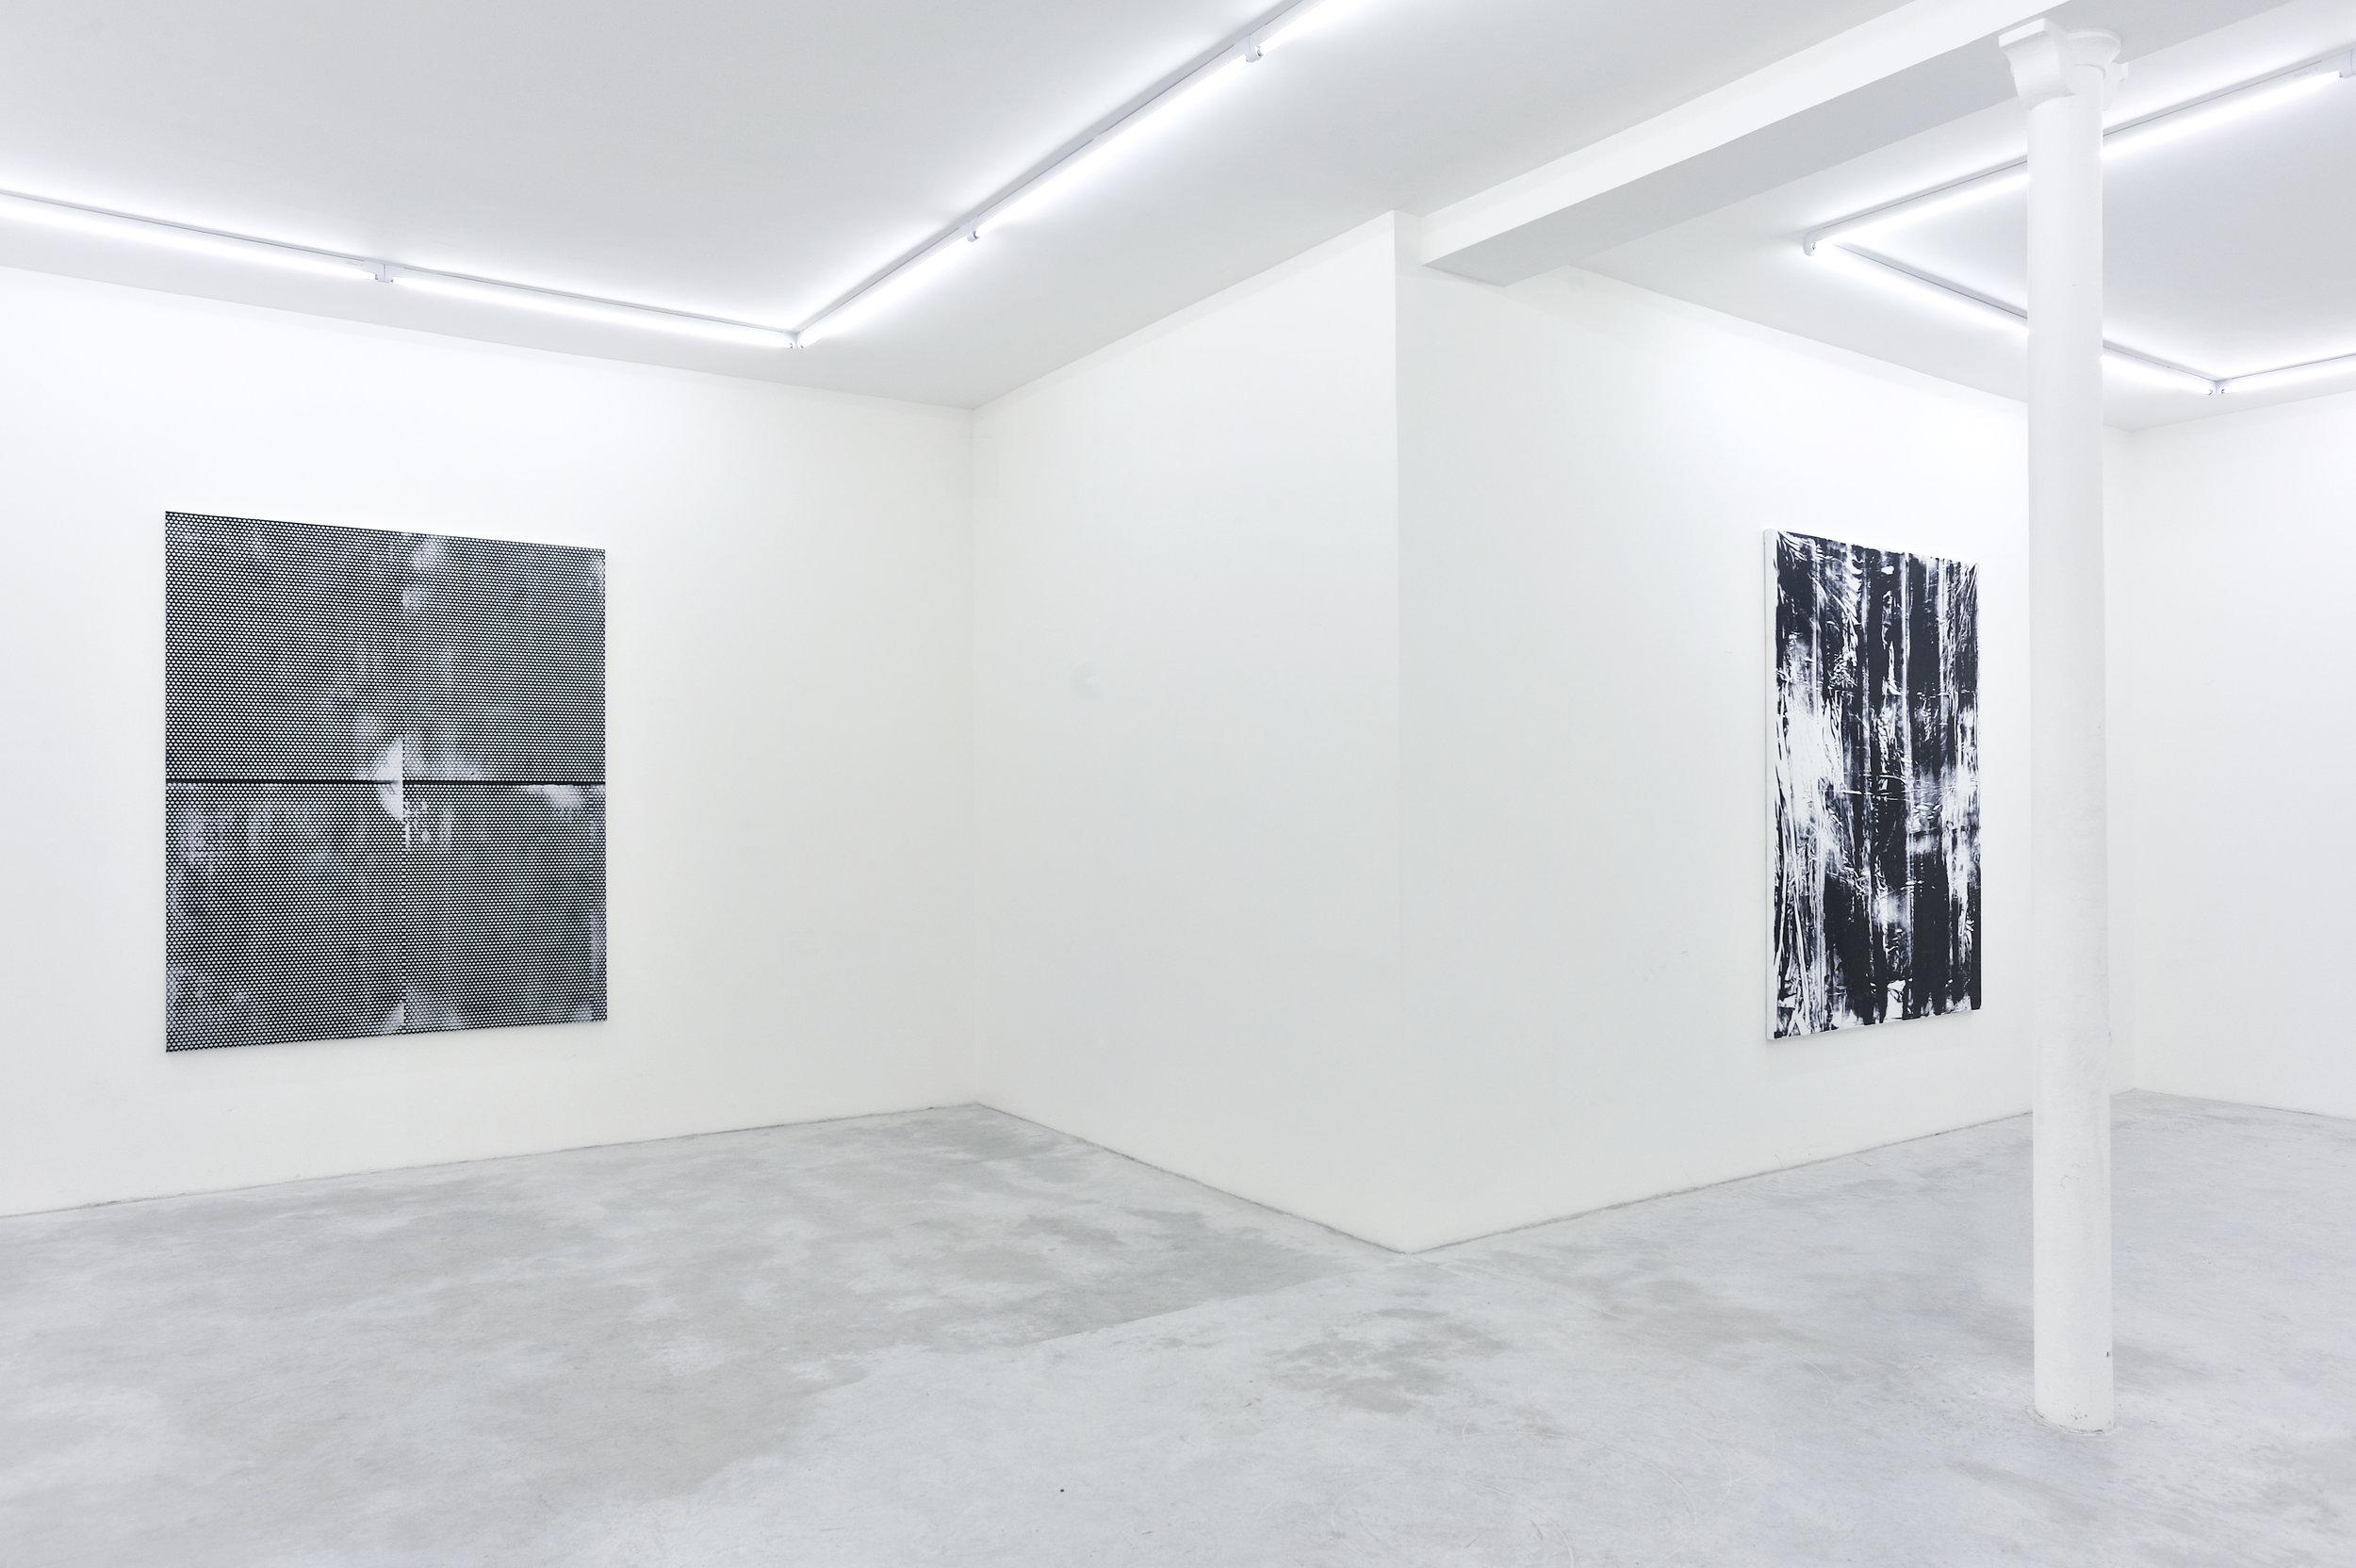 Thomas Fougeirol,  Black Sun,  Installation view at Praz-Delavallade, Paris, FR, April 2 - May 7, 2011